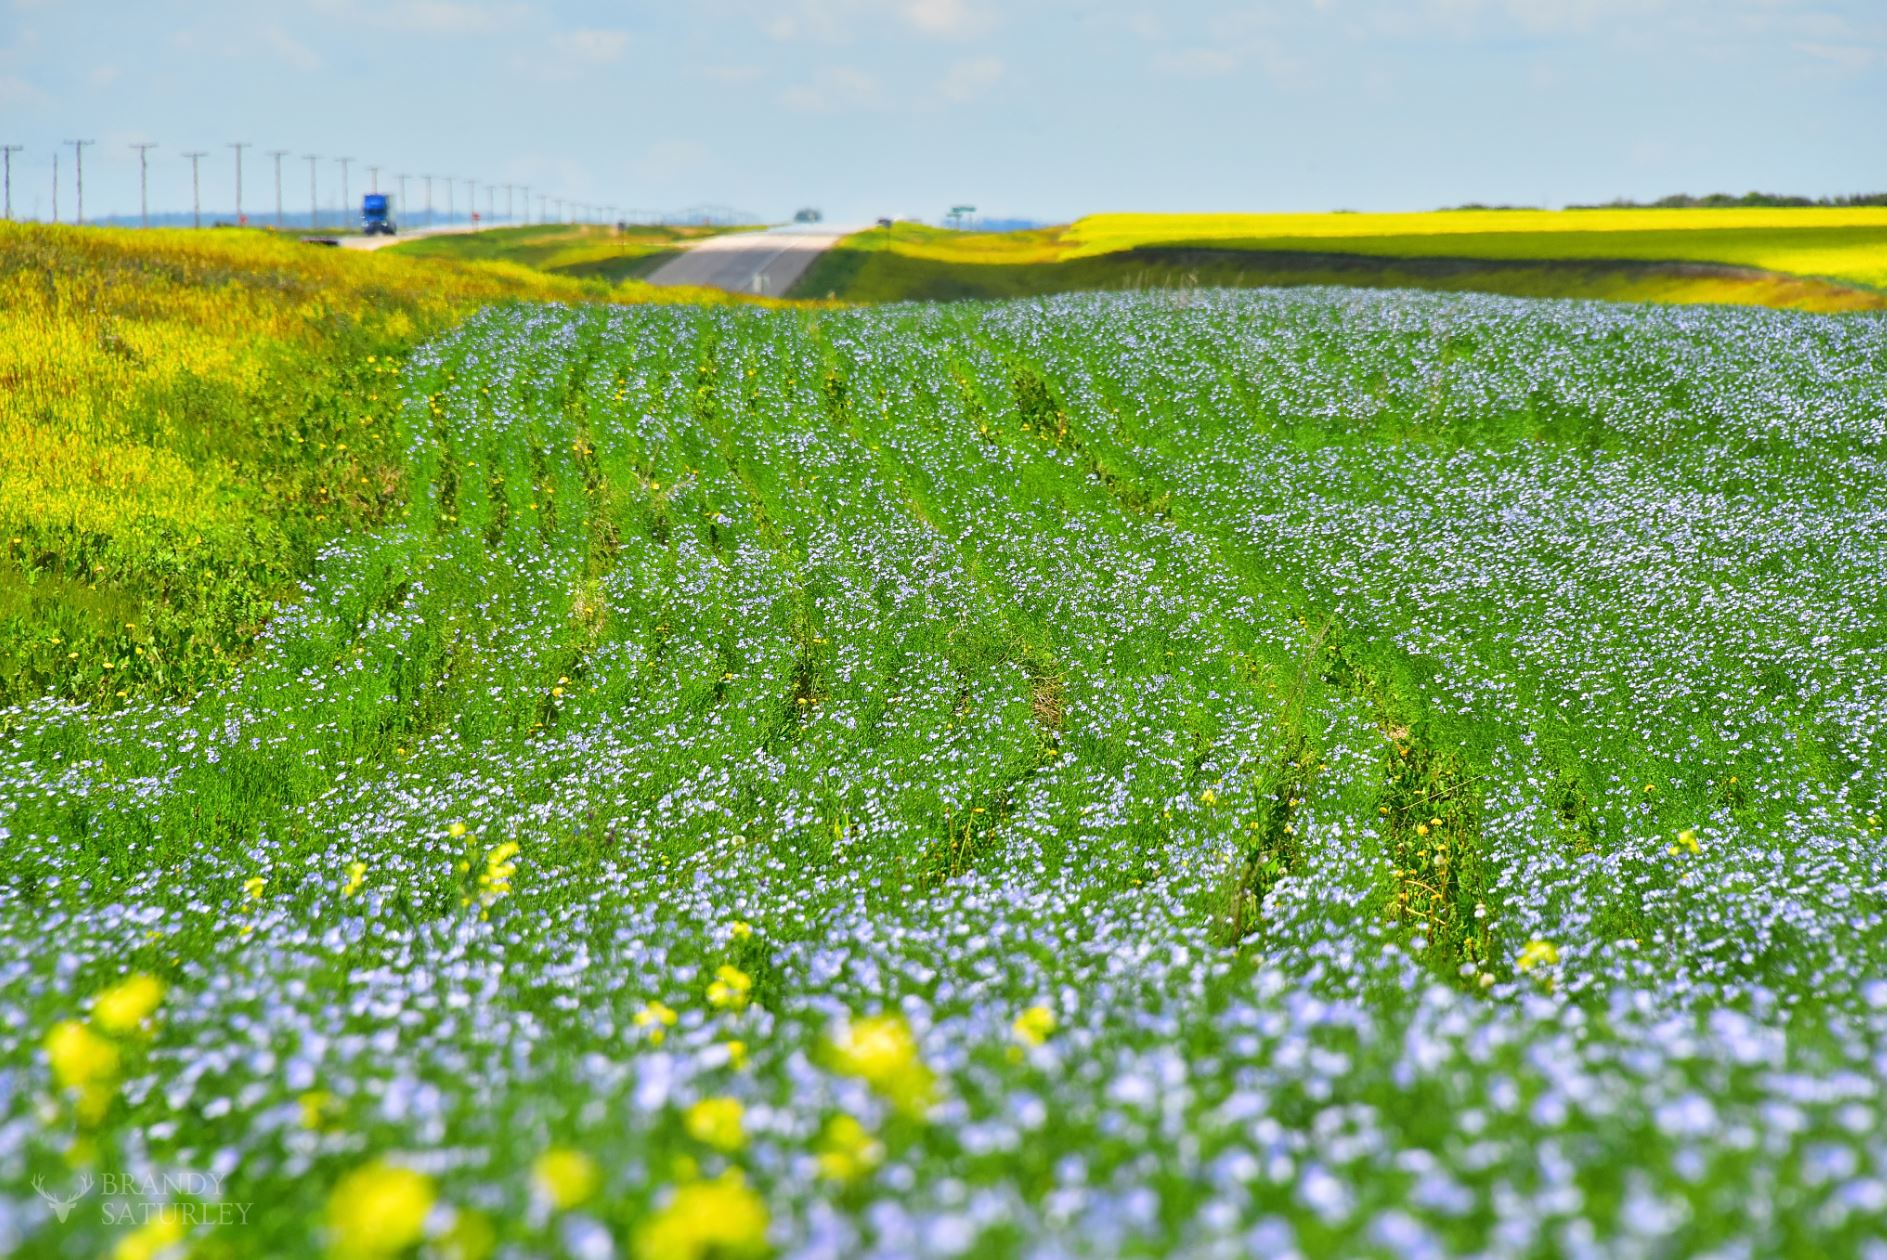 Saskatchewan roadside fields of flax blue and canola yellow